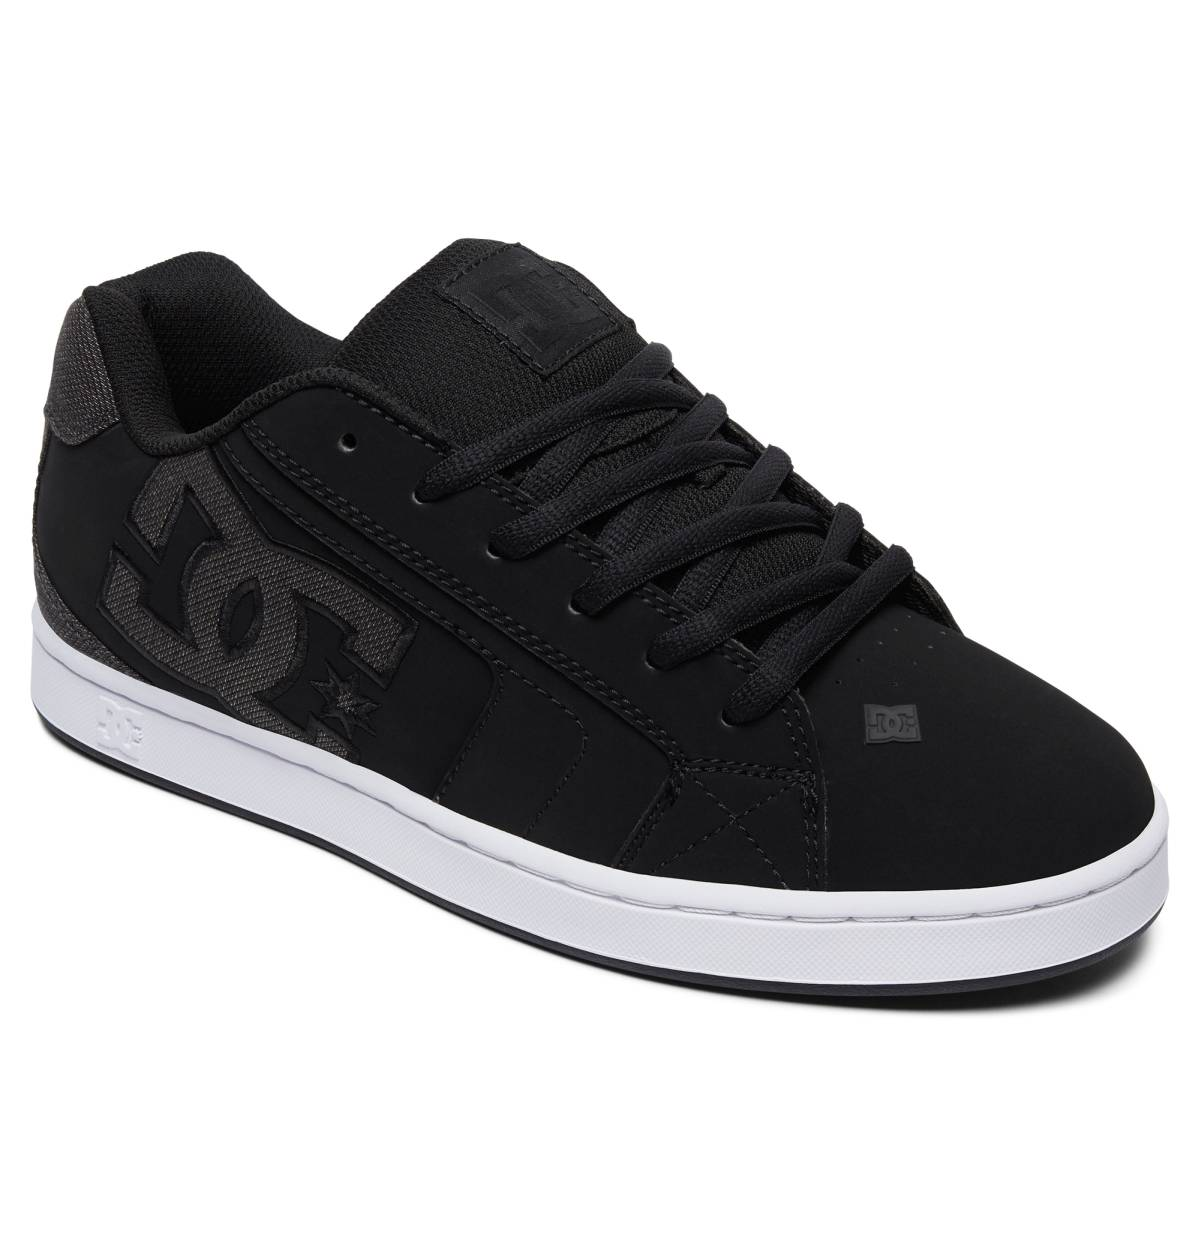 DC Schuhe Net SE Textil Niedrig-Cut Sneaker Freizeitschuhe Skateschuhe Leder Textil SE Schuhe 33f8f4